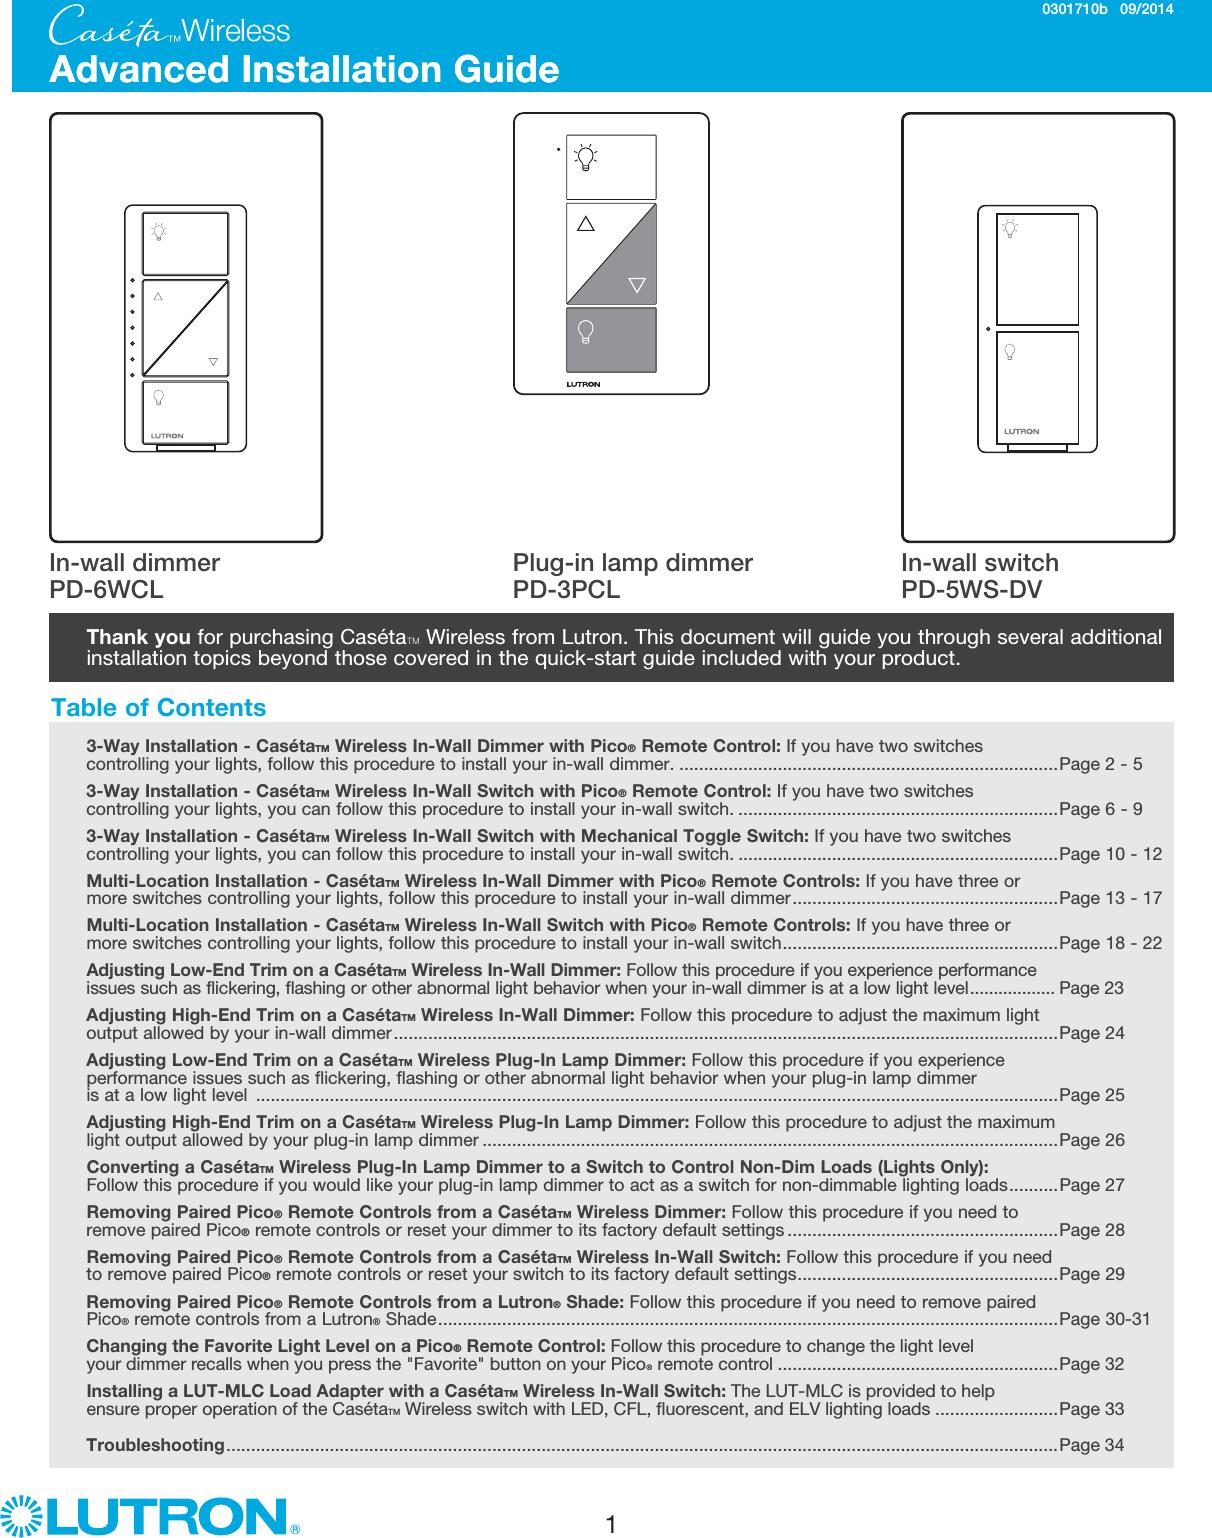 Caseta Wireless Advanced Installation Guide Part 0301710b Directions Mlc Light Controller Wiring Diagram